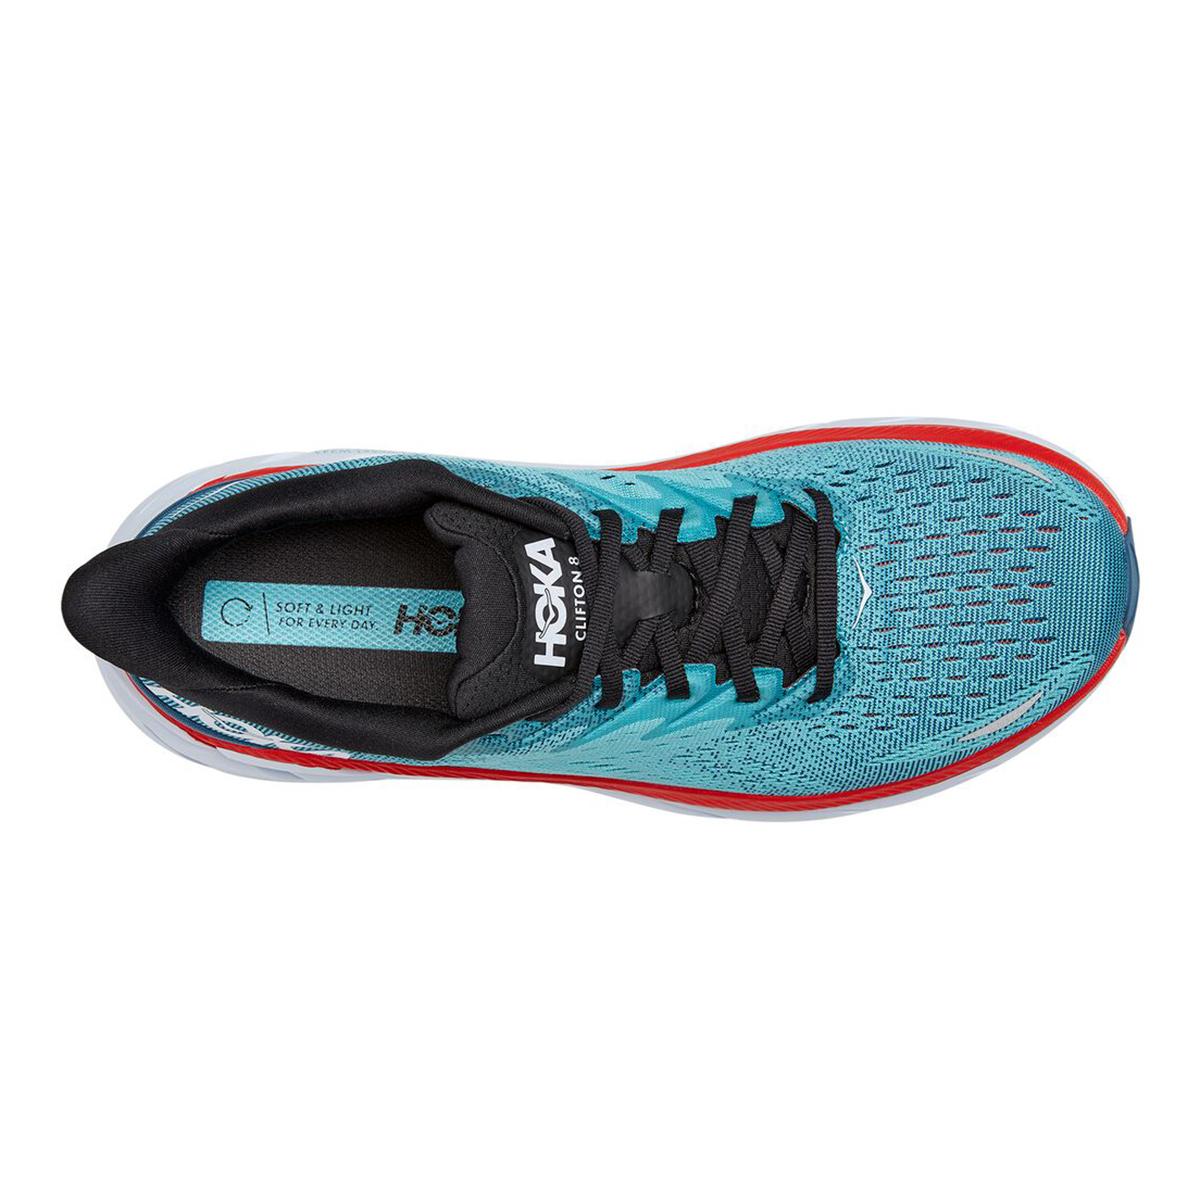 Men's Hoka One One Clifton 8 Running Shoe - Color: Real Teal/Aquarelle - Size: 7 - Width: Regular, Real Teal/Aquarelle, large, image 3